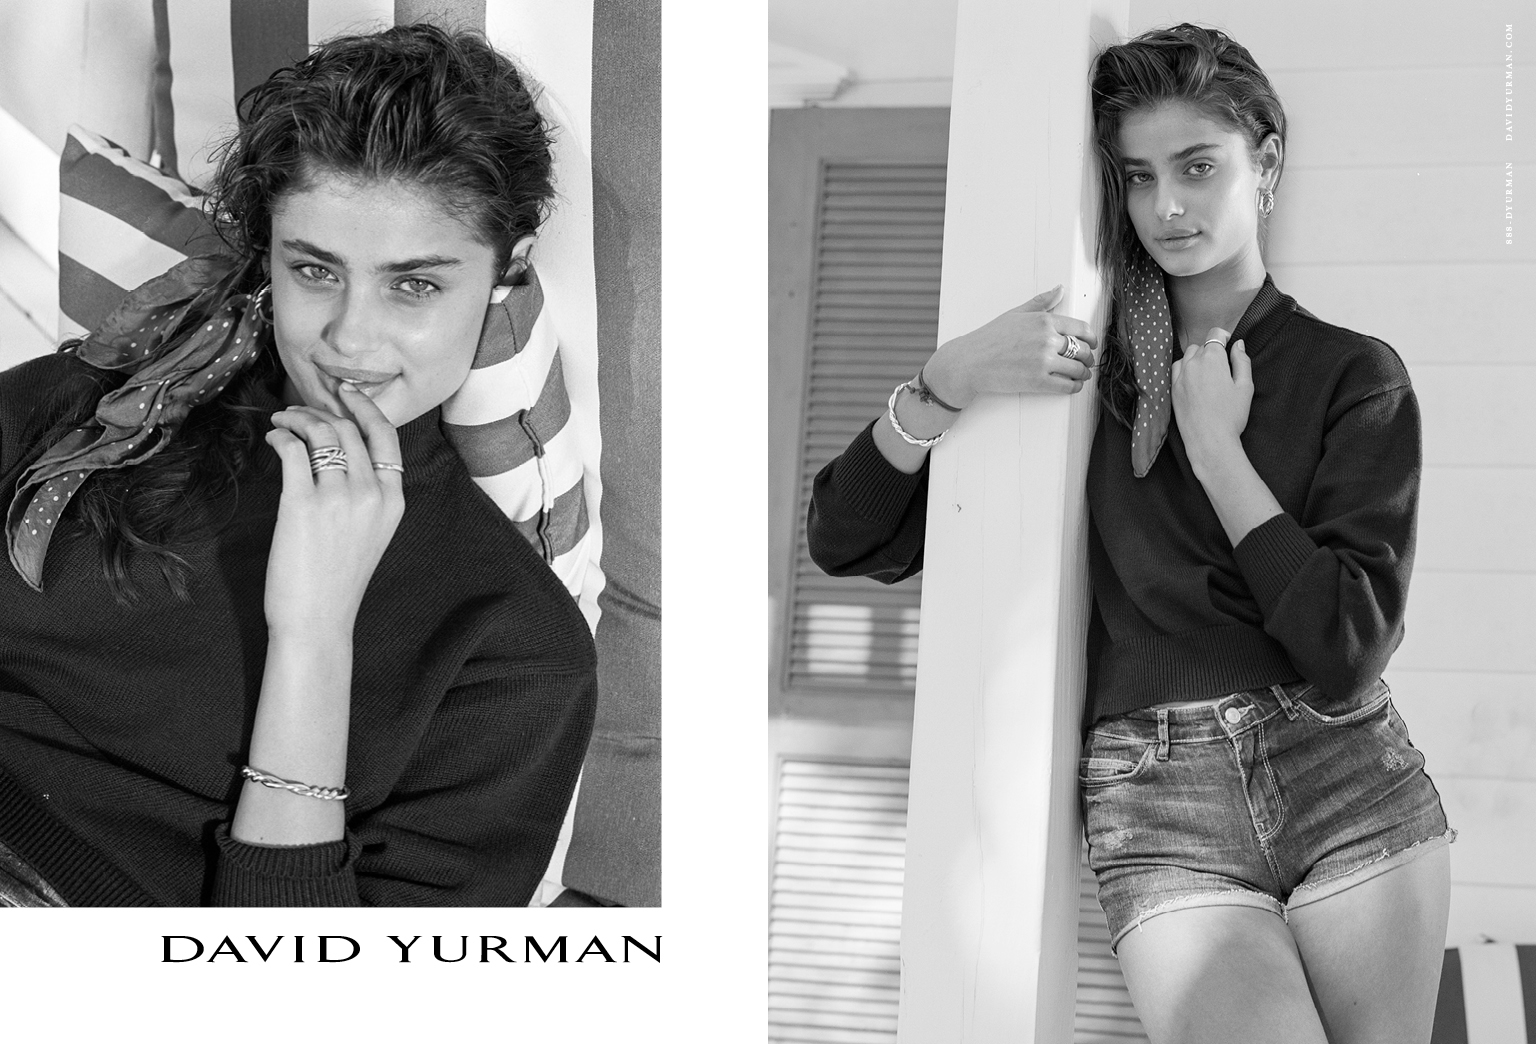 Client: David Yurman Season: Spring / Summer 2017 Photography: Bruce Weber Art Director: Sam Shahid Models: Natalia Vodianova, Taylor Hill Product: Continuance Collection